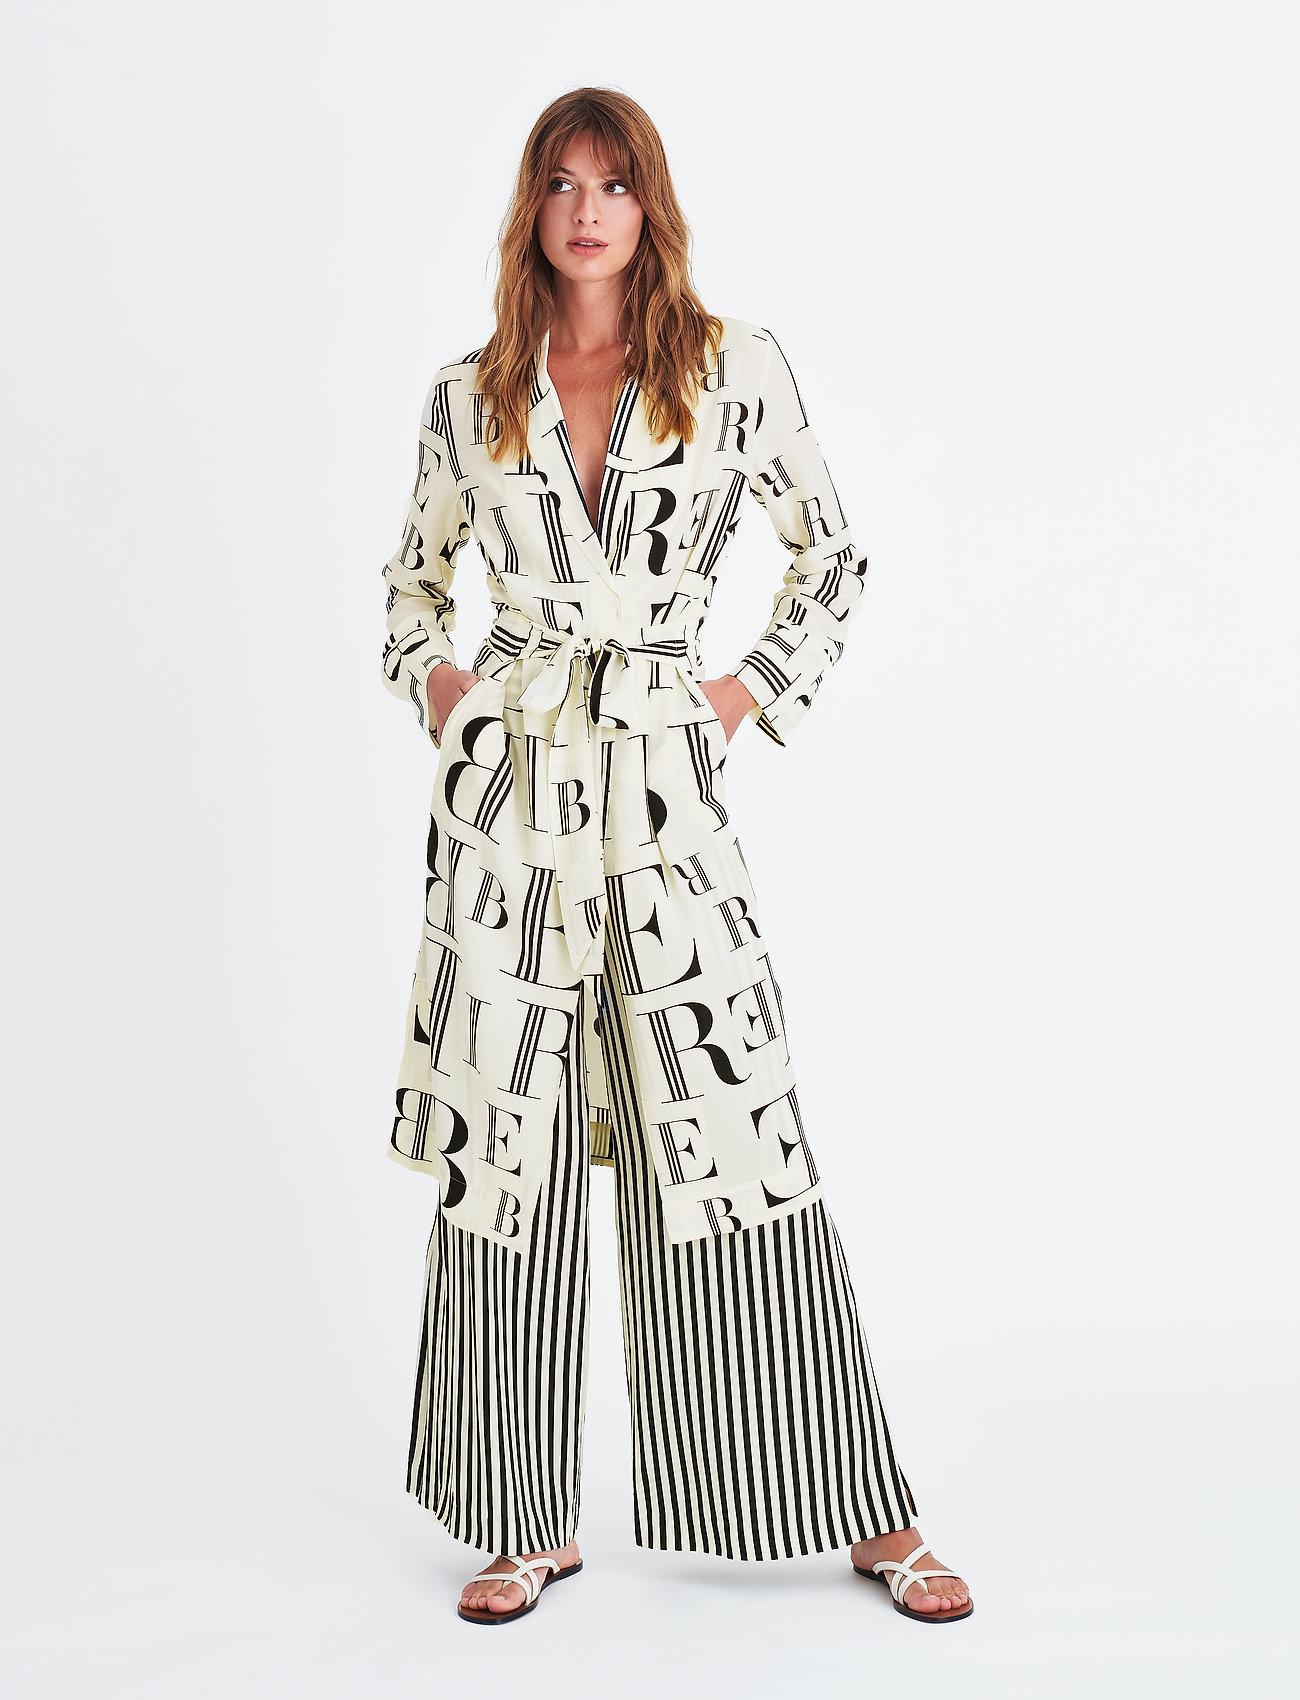 Collection Hampton KimonoblackElle Style Awards 2019 HID2E9